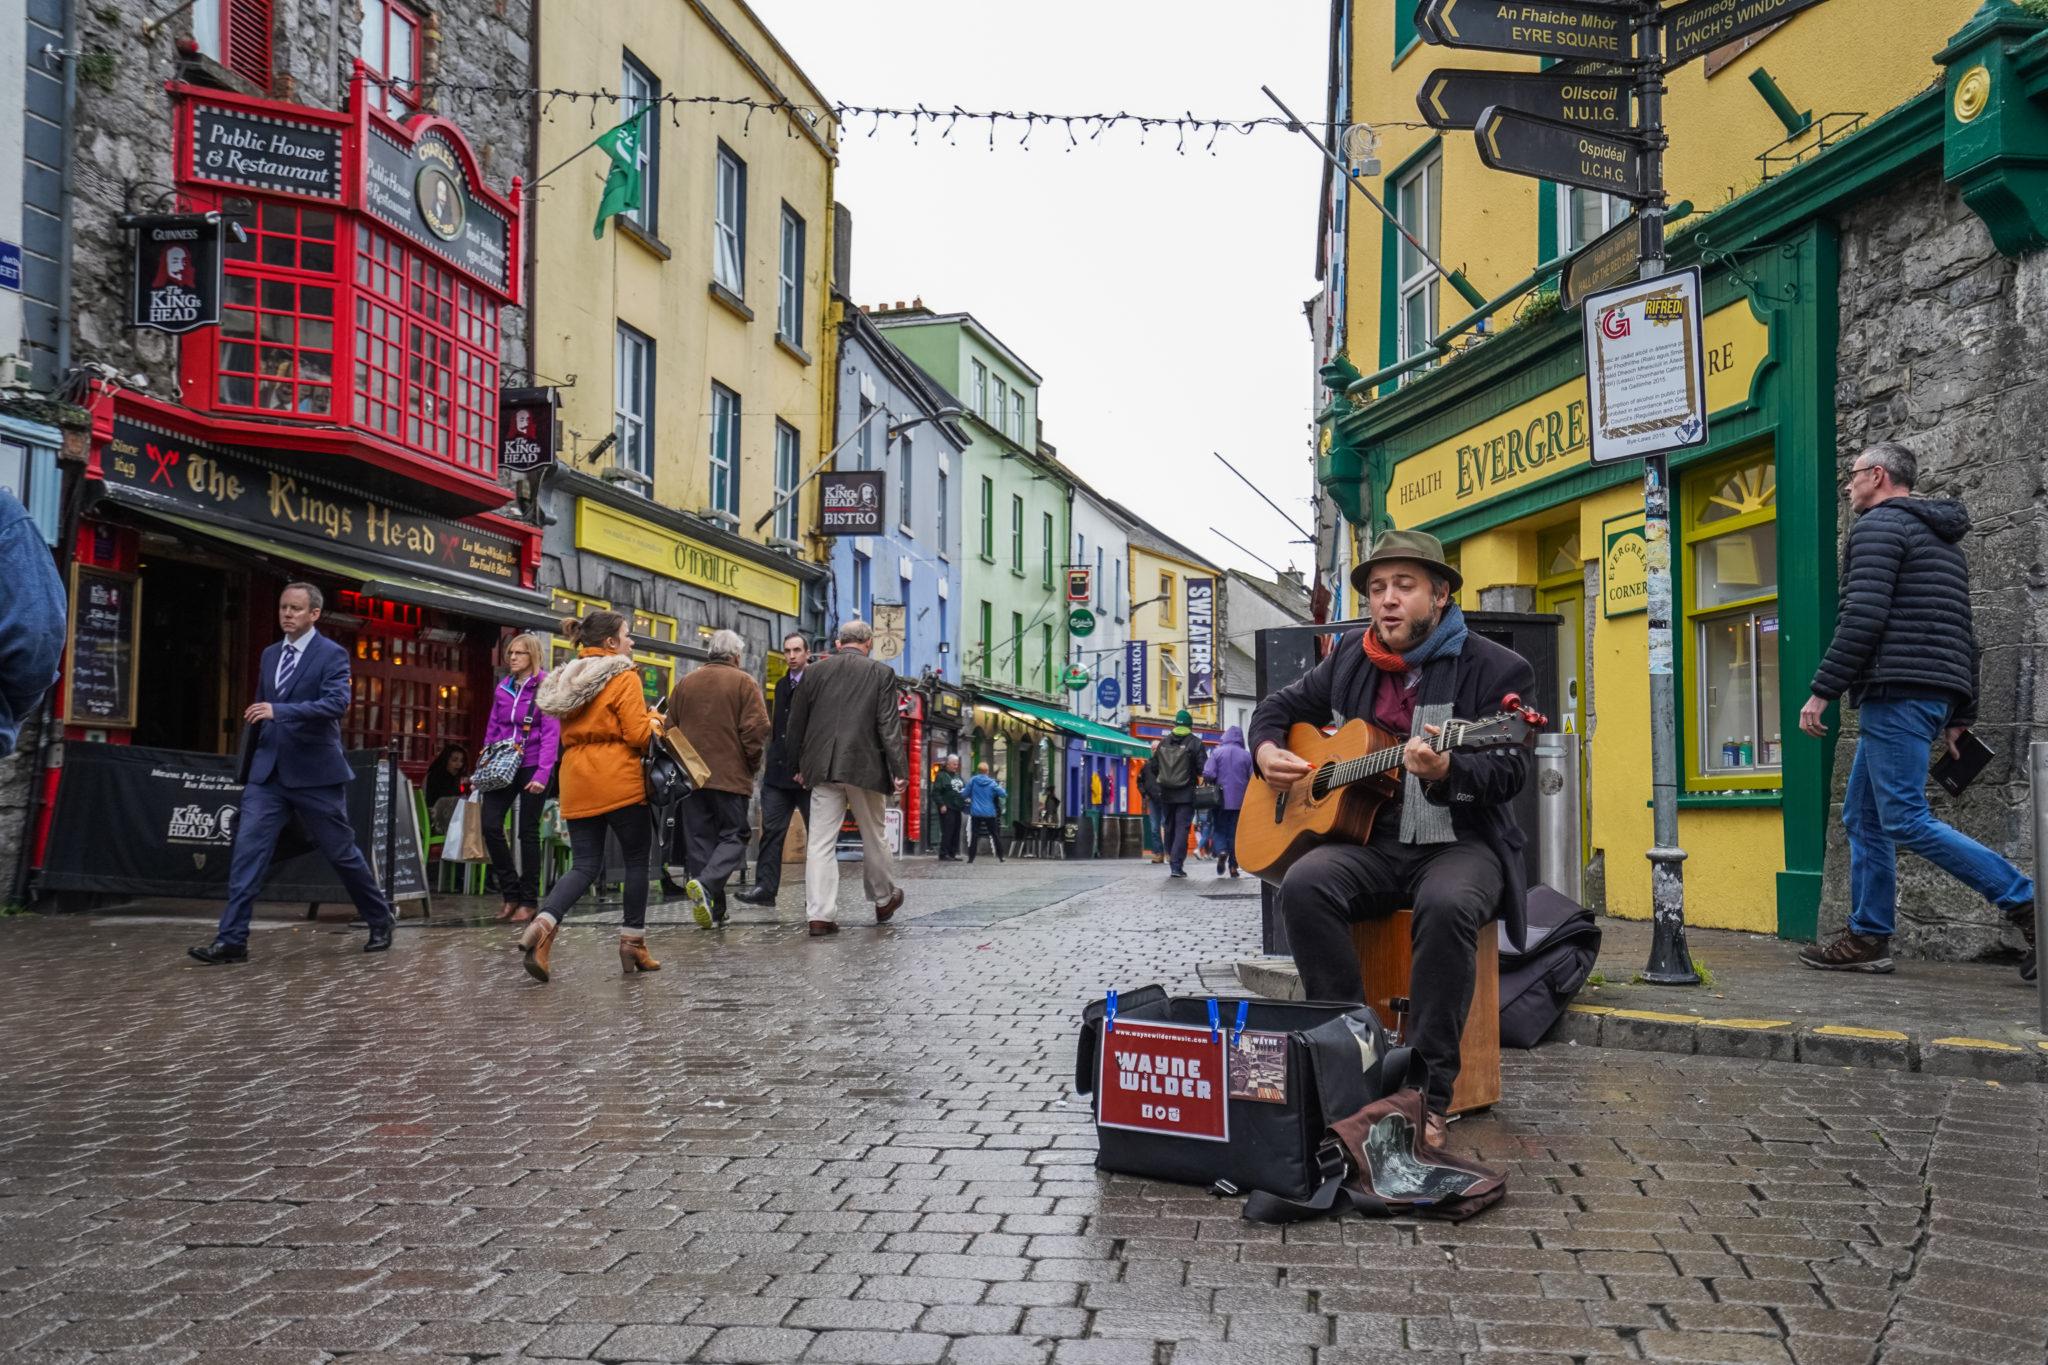 galway-irlande-musique-centre-visite-voyage